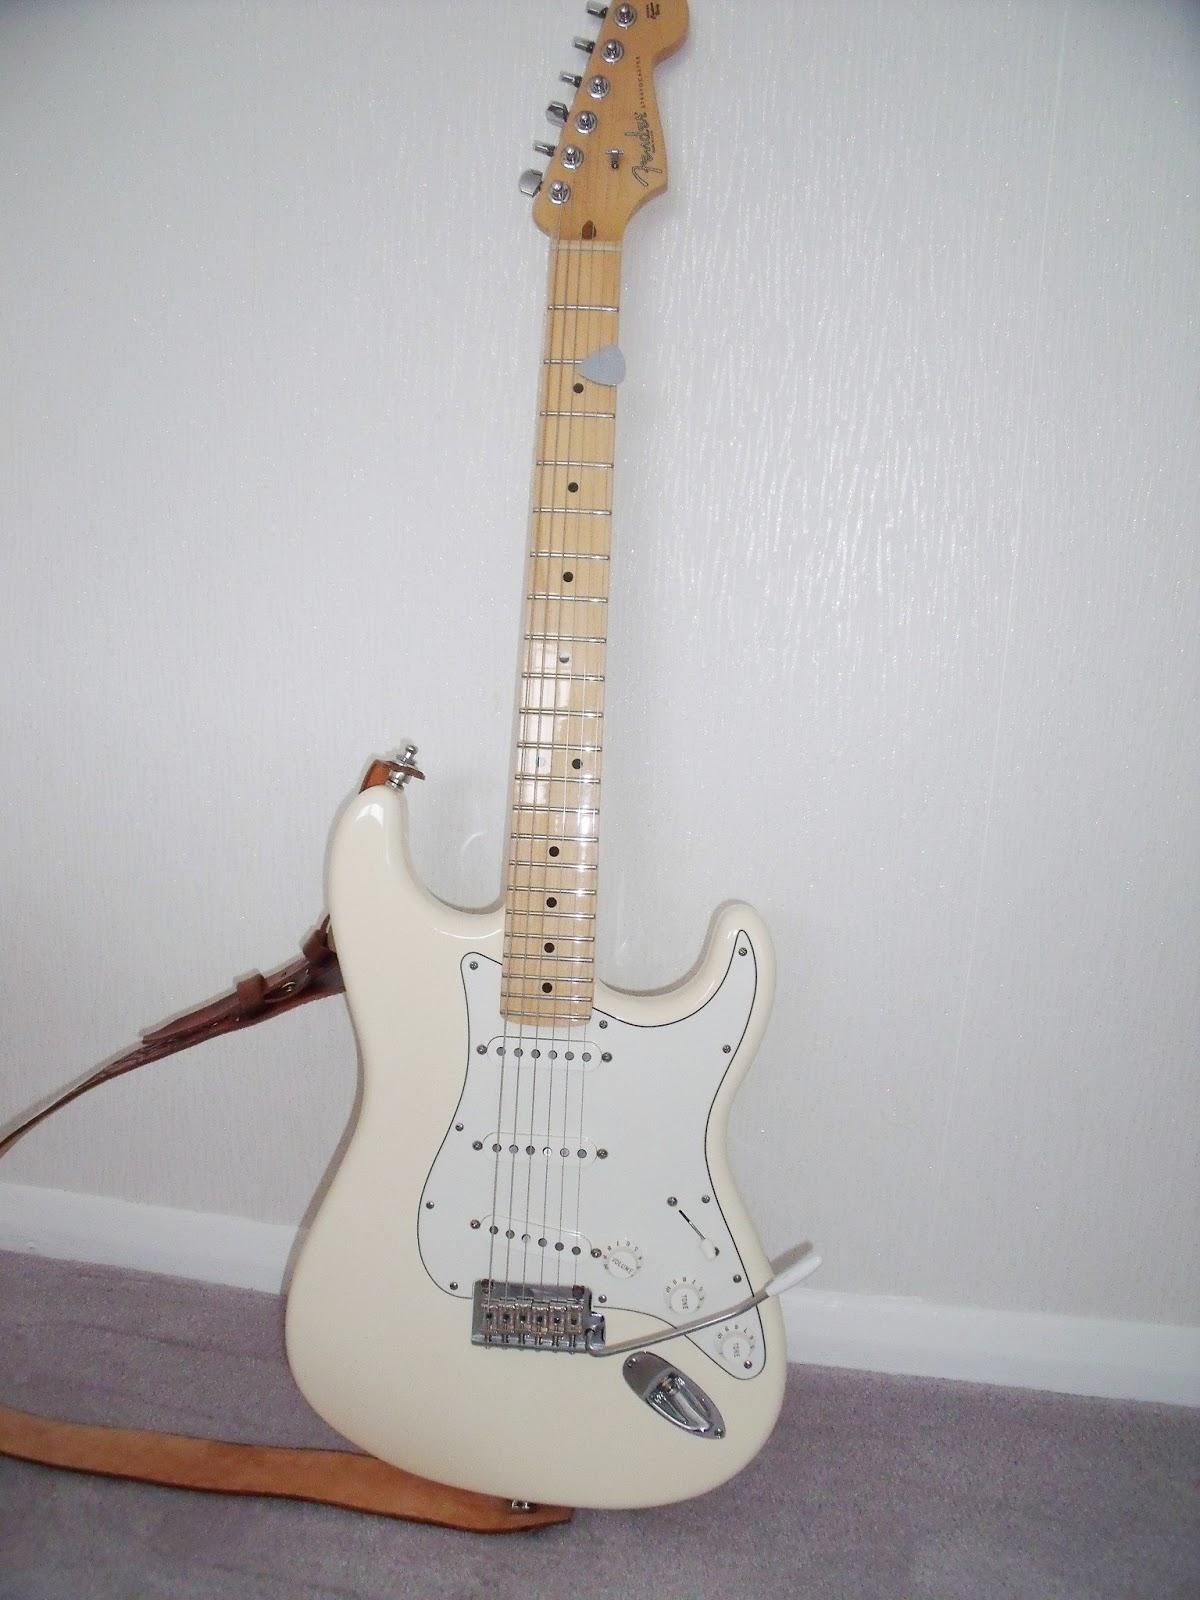 American Standard Stratocaster 2008 - 2009 - Dave Monk